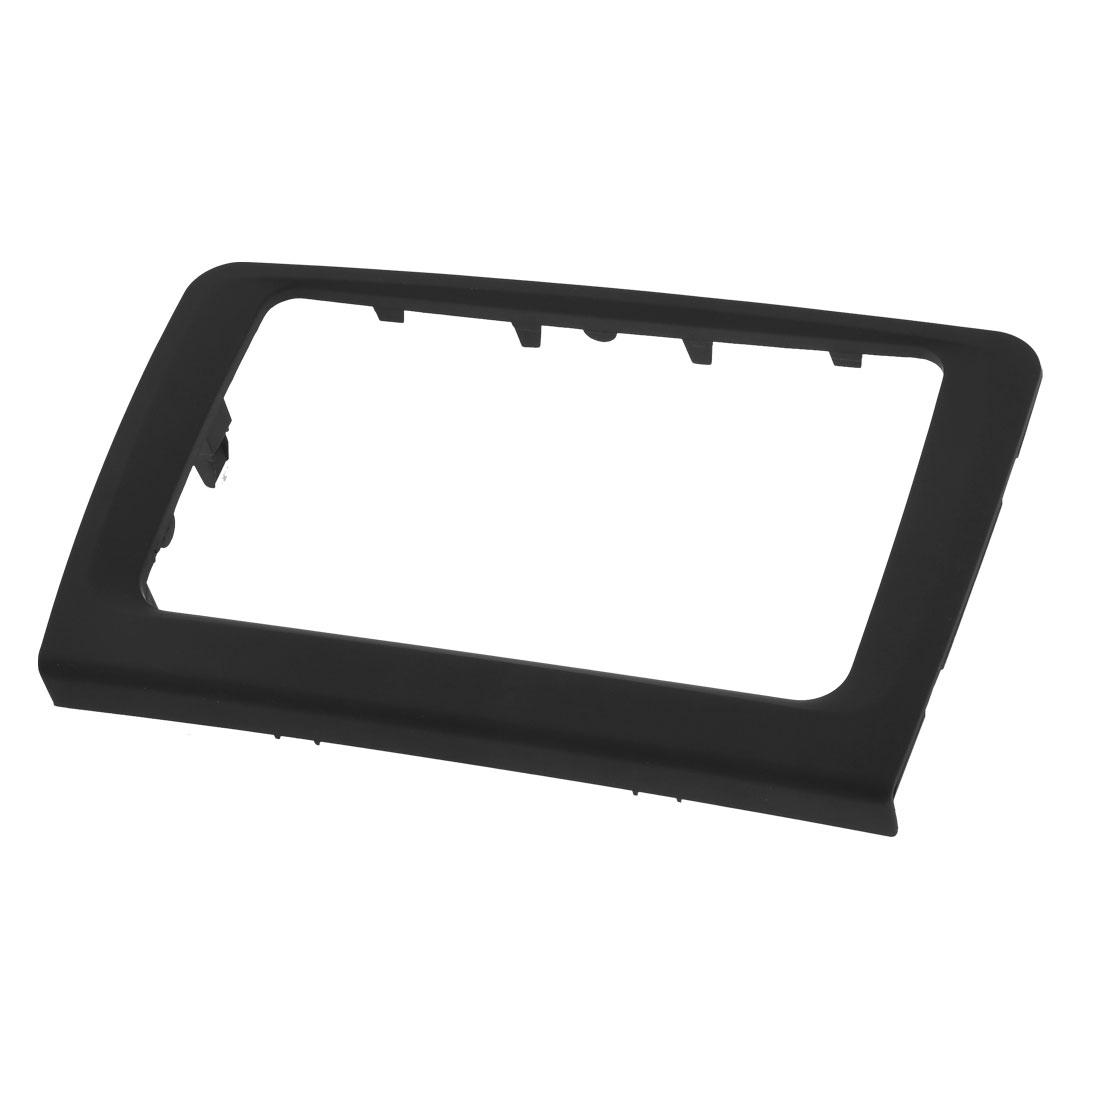 Black Plastic Sudio Stereo System DVD Holder Frame for Volkswagen Superb